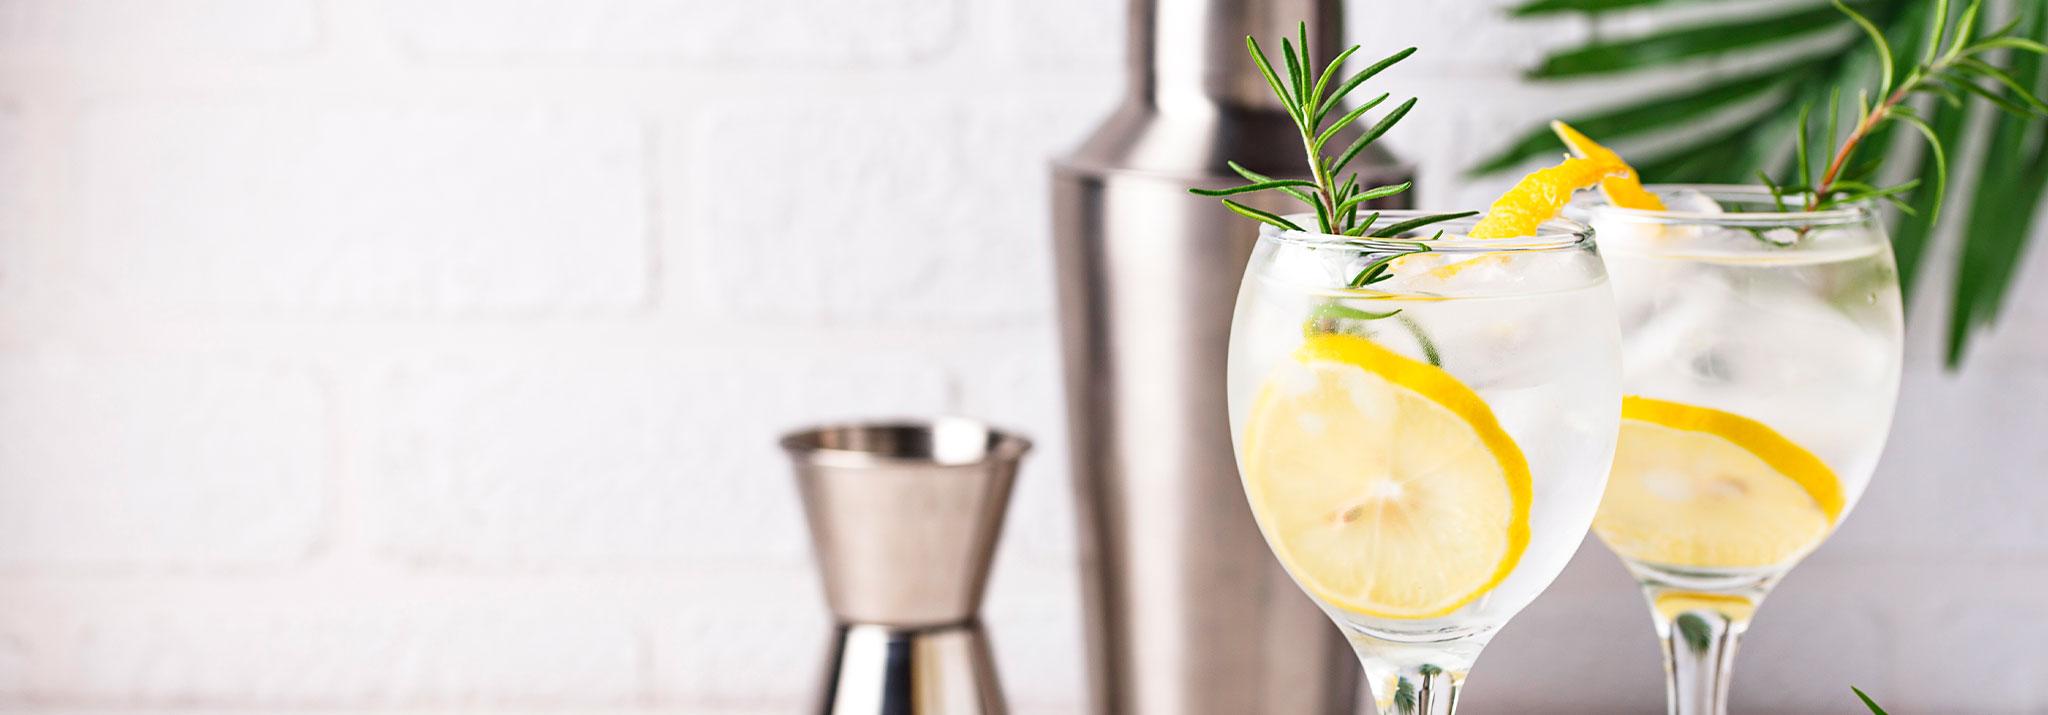 gin-tonic-cocktail-with-lemon-spiritueux